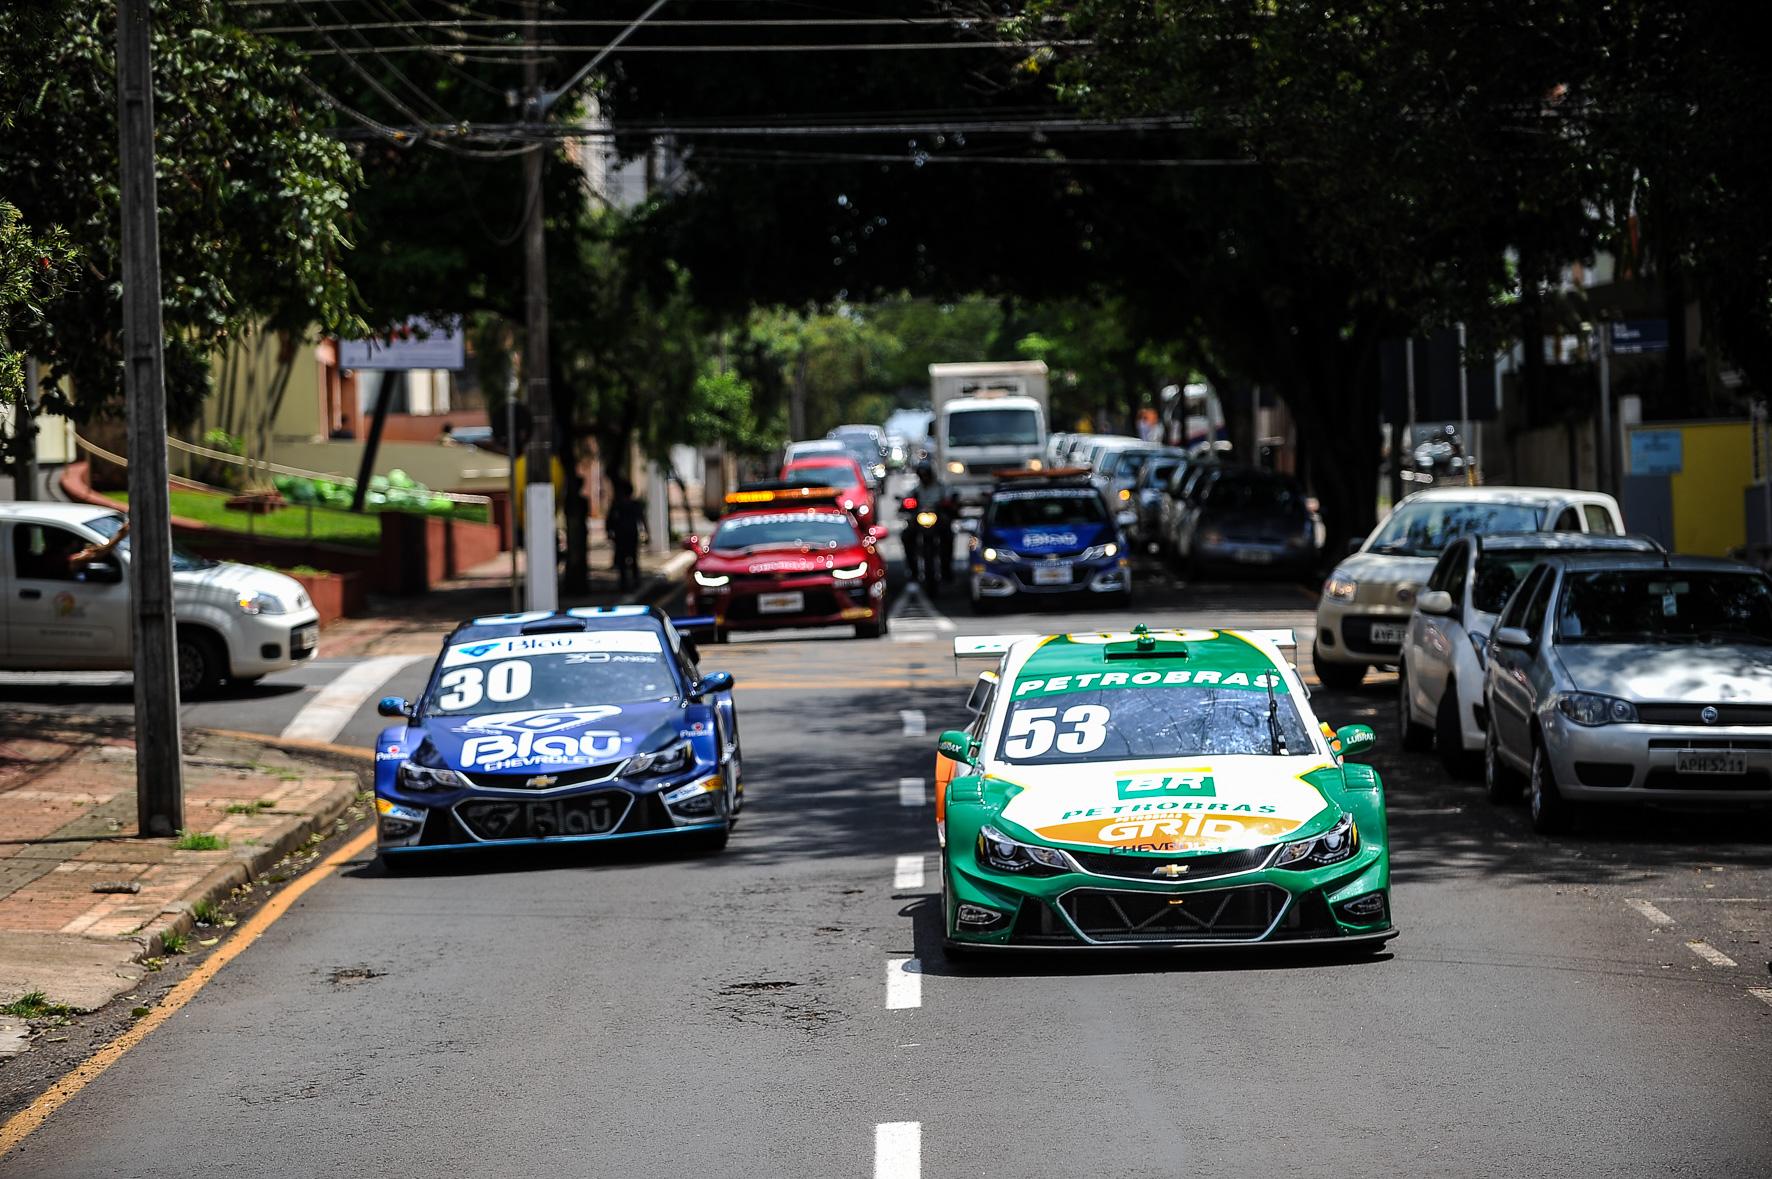 StockCar2018_dudabairros_Londrina-10484.